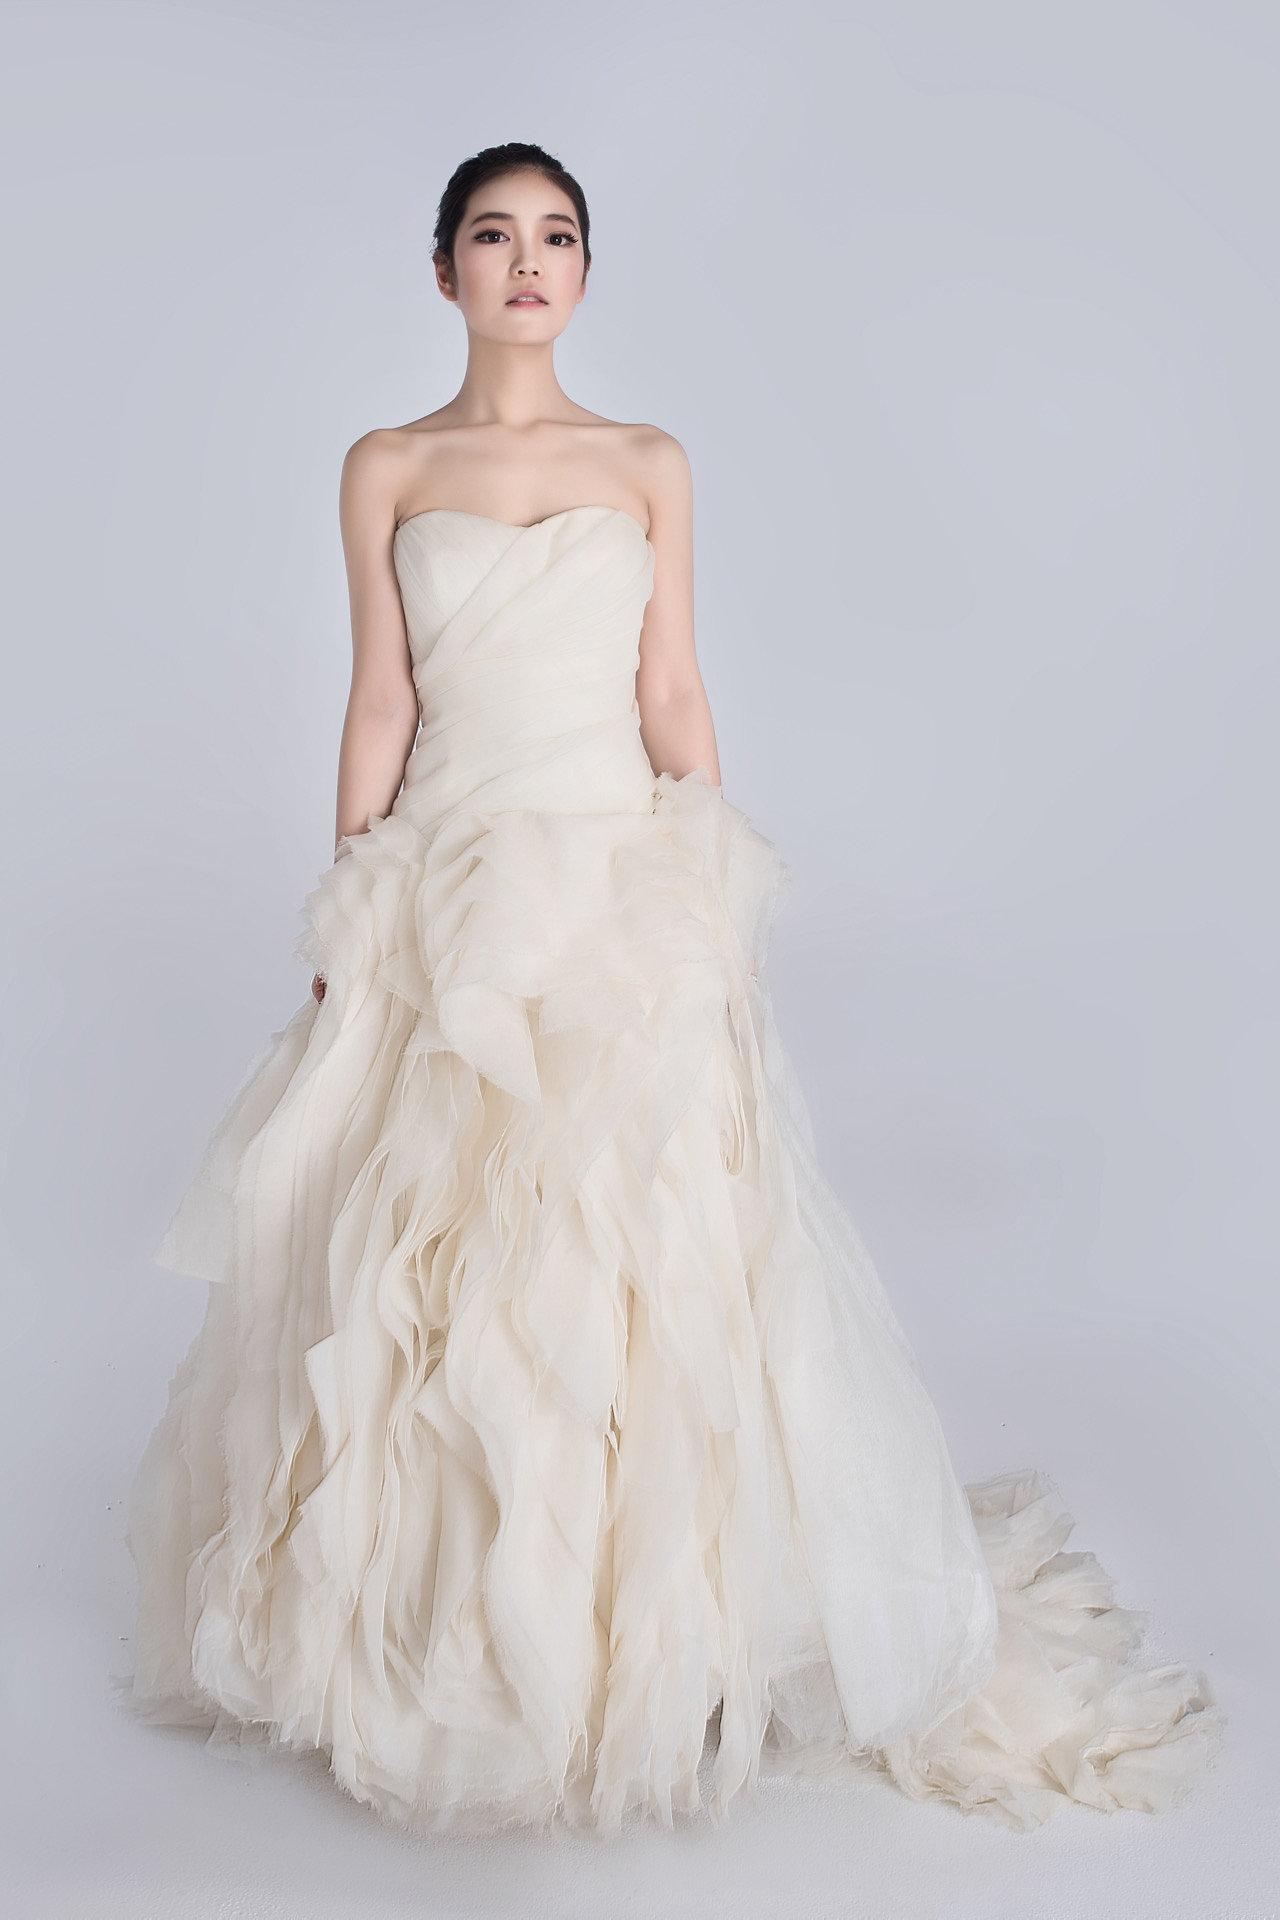 Delightful Lz Bridal Designer Wedding Dress Rental | Vera Wang Diana Luxury .